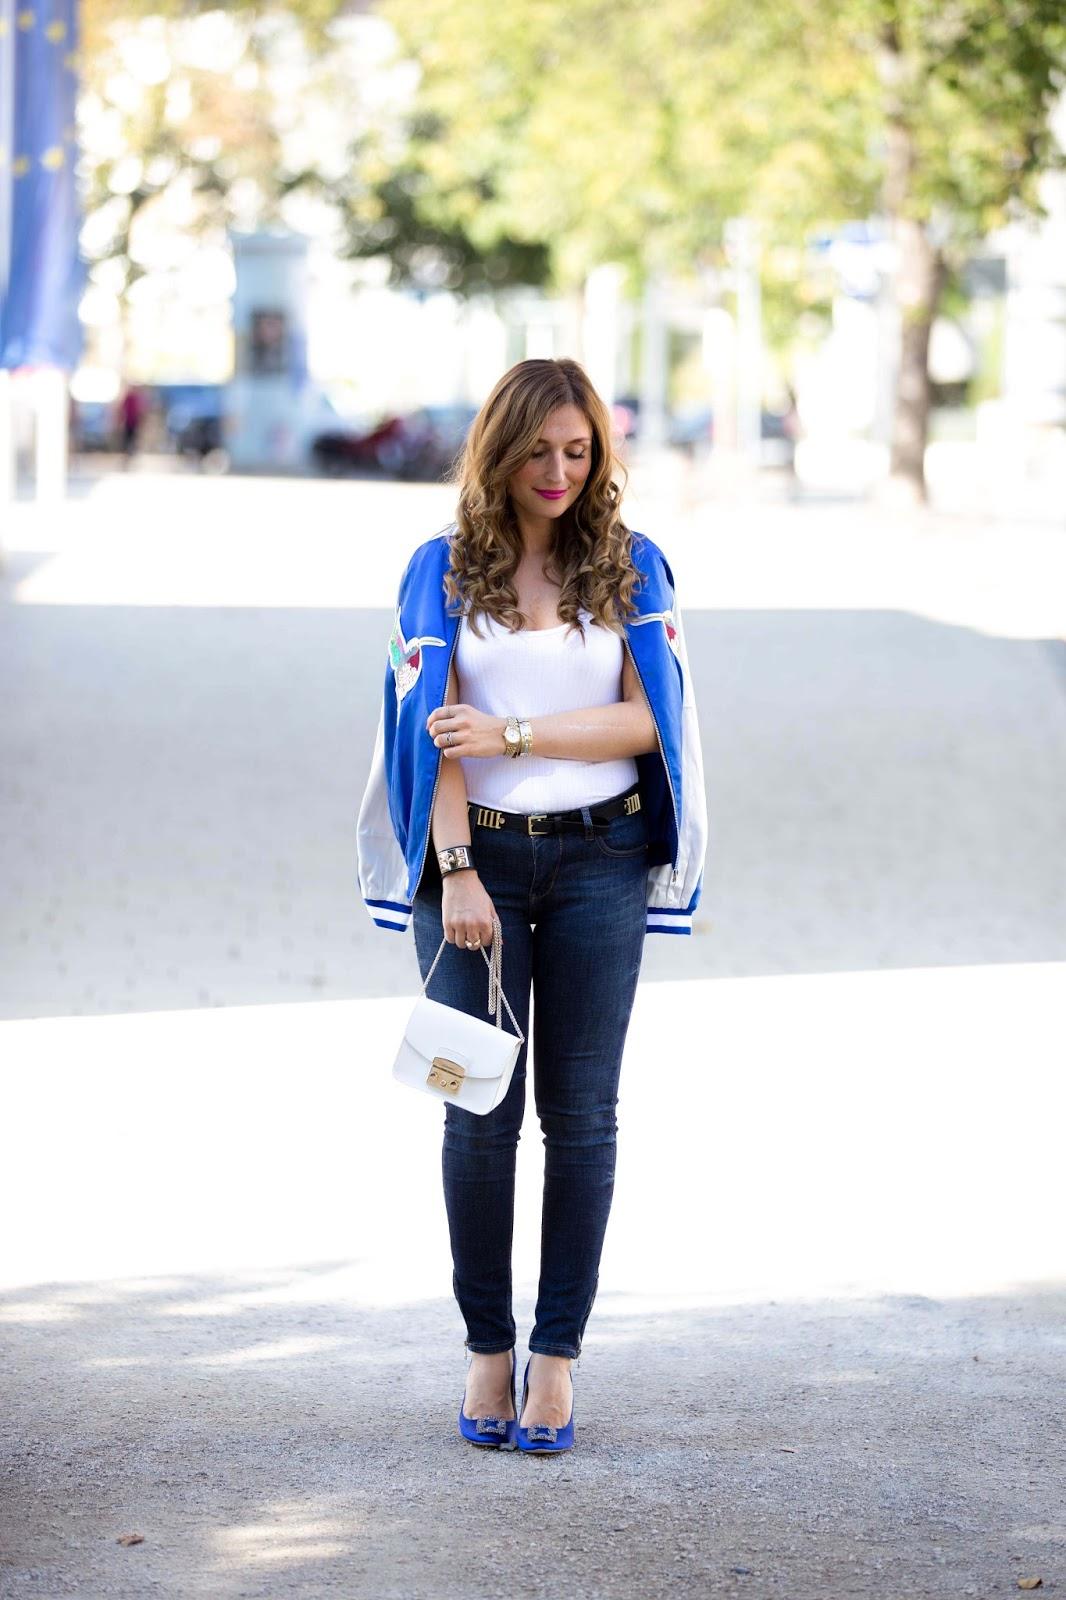 Manolo Blanik Shuhe - Blaue Manolo Blanik Schuhe kombinieren Bomber Jacke - Blaue Jacke - Blaue Sheinside Jacke wie Olivia Palermo - Olivia Palermo Stil - Fashionstylebyjohanna-Herbstlook Blogger-fashionblog-frankfurtmurtblogger-fashionblogger